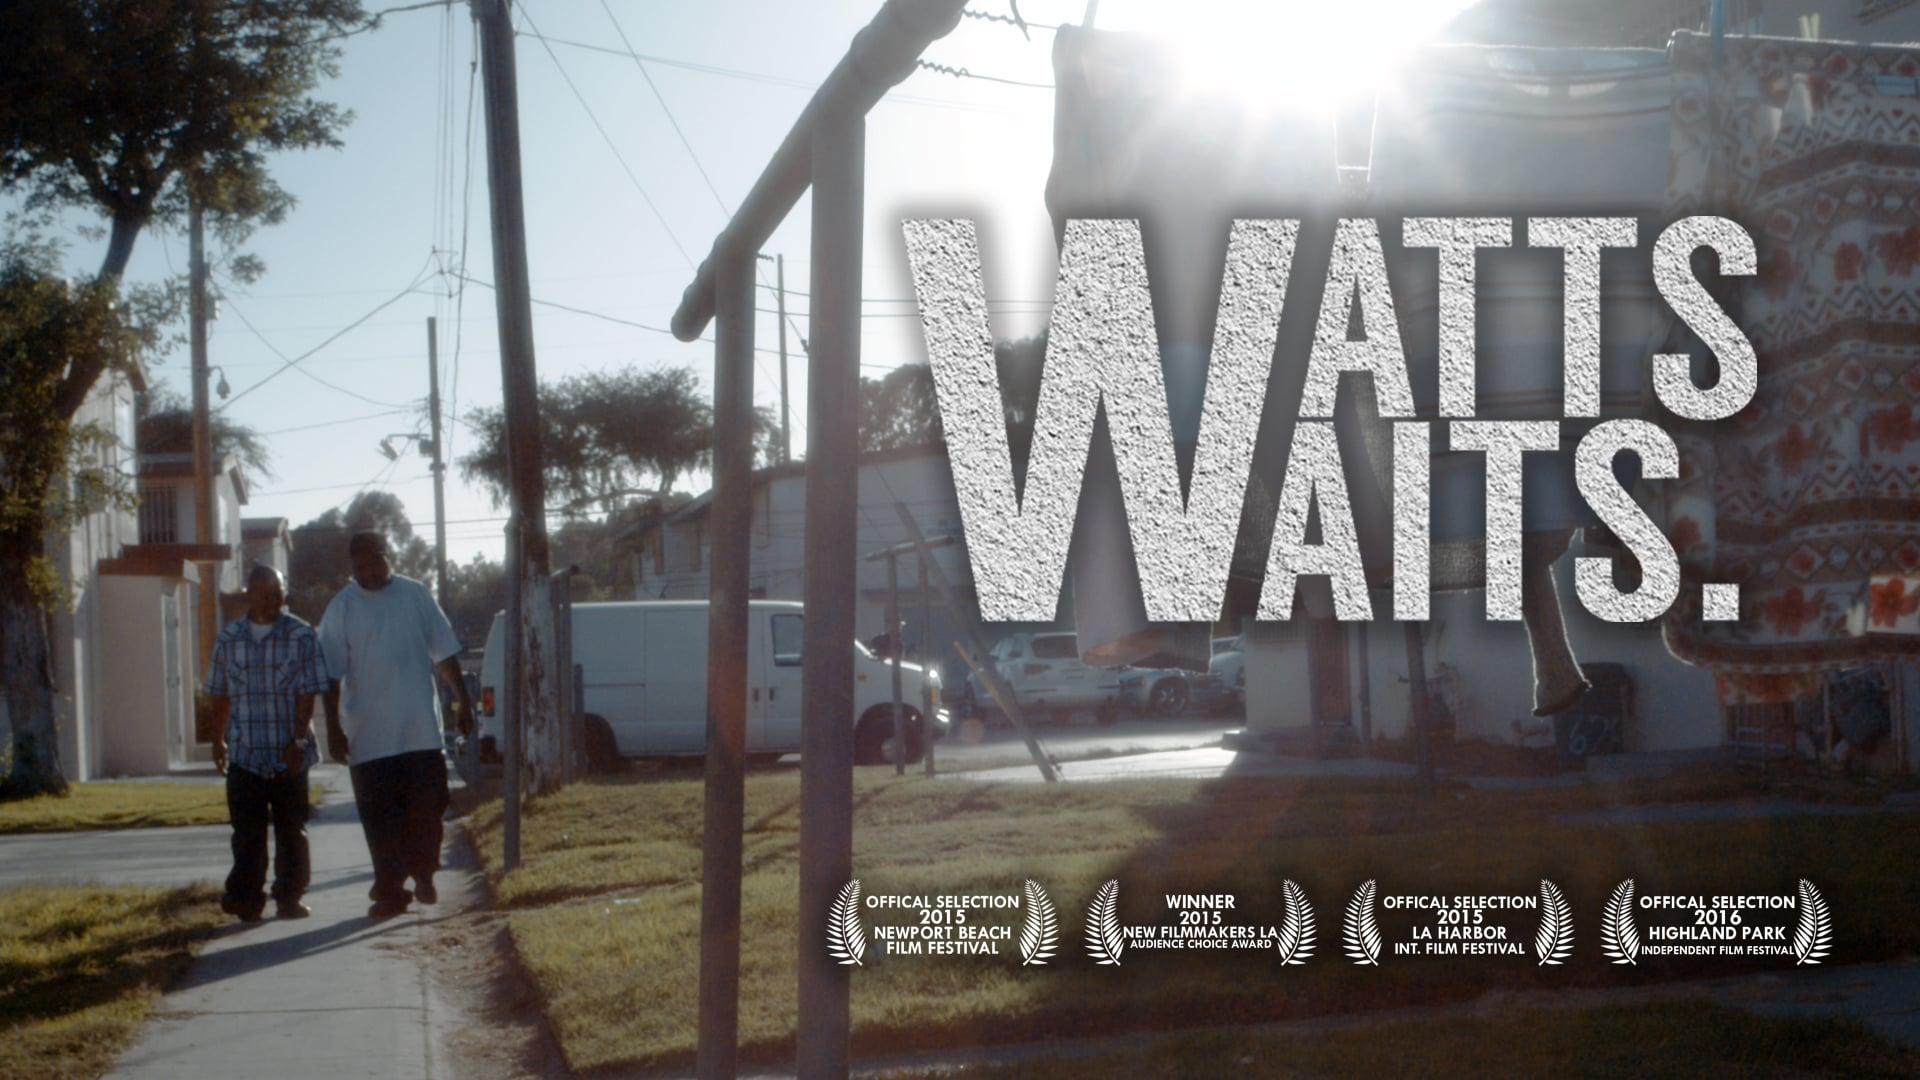 WATTS WAITS - The Redevelopment of Jordan Downs